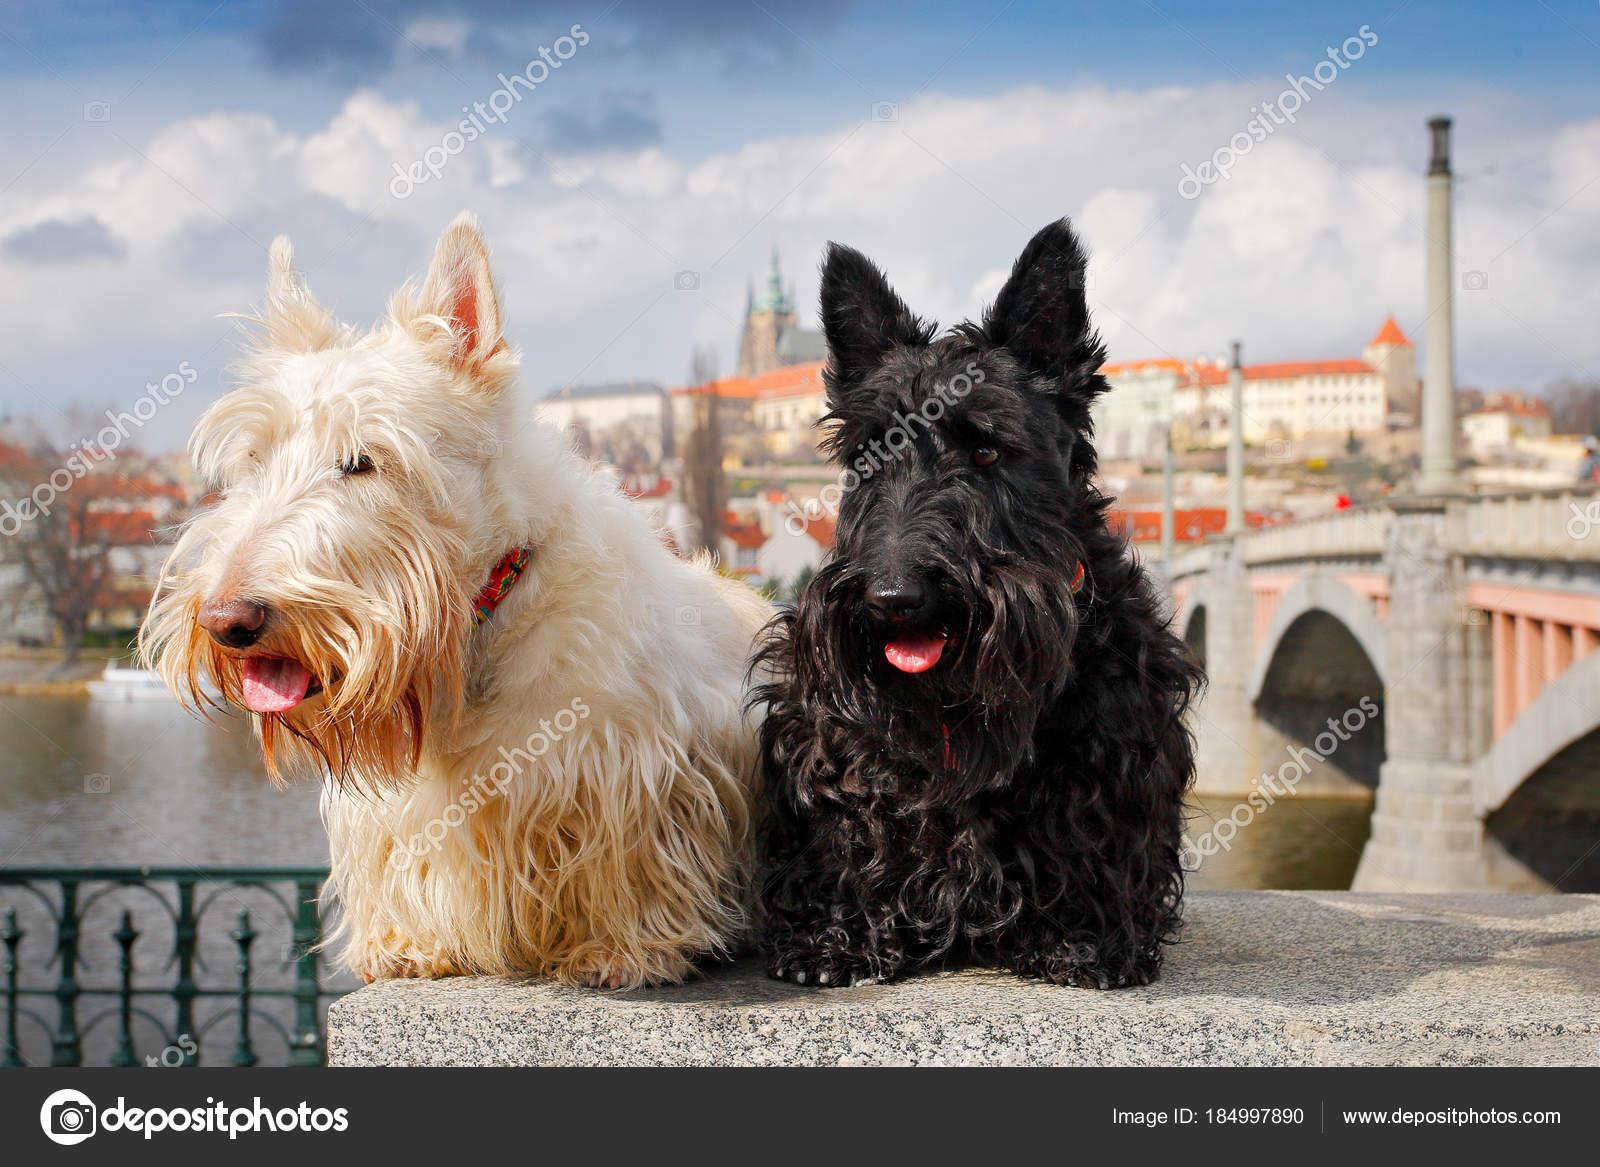 Black And White Whisky Dogs Scottish Terrier Black White Wheaten Dog Pair Beautiful Dogs Sitting Stock Photo Ondrejprosicky 184997890